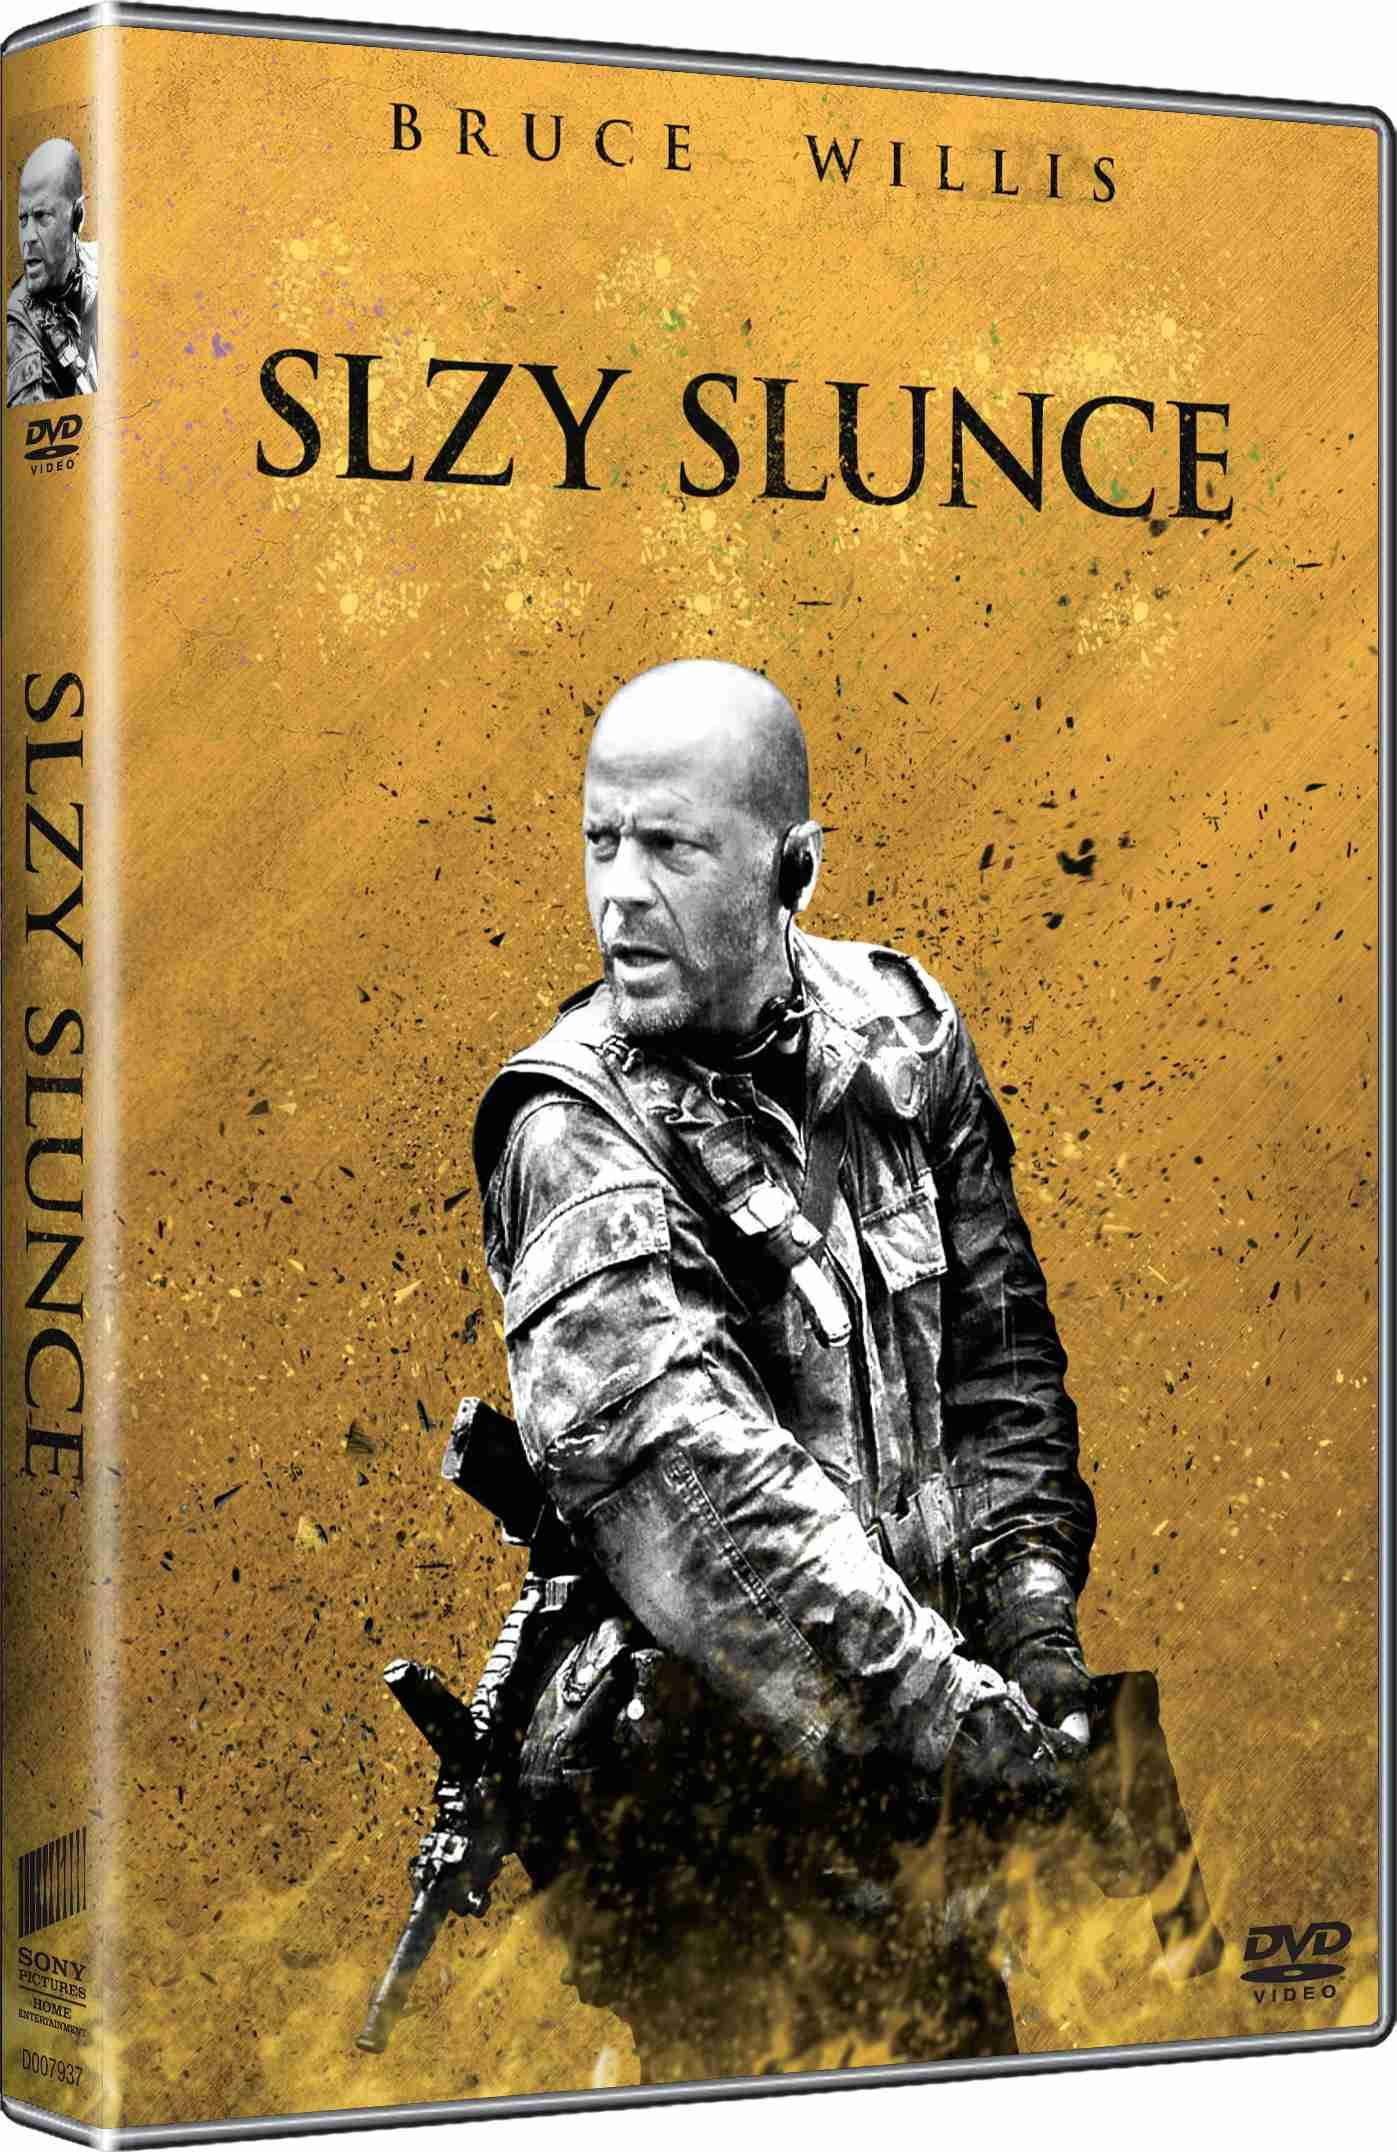 SLZY SLUNCE (Big Face) - DVD